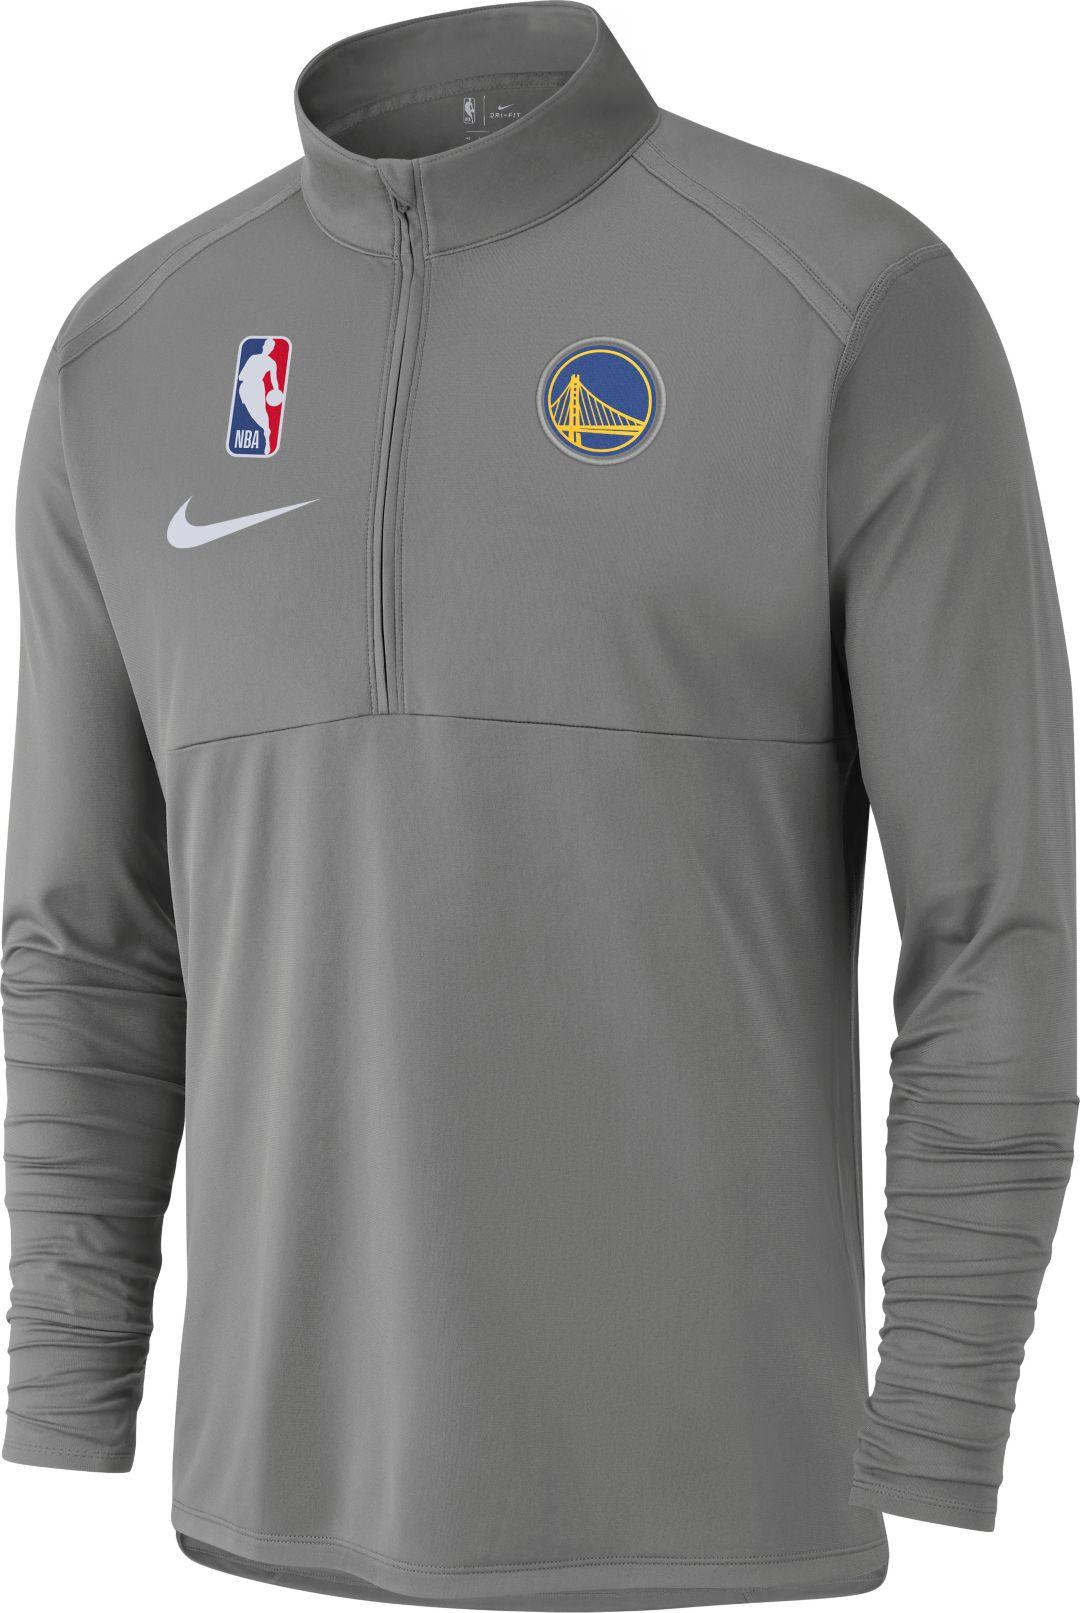 Nike Men's Golden State Warriors Dri FIT Element Half Zip Pullover